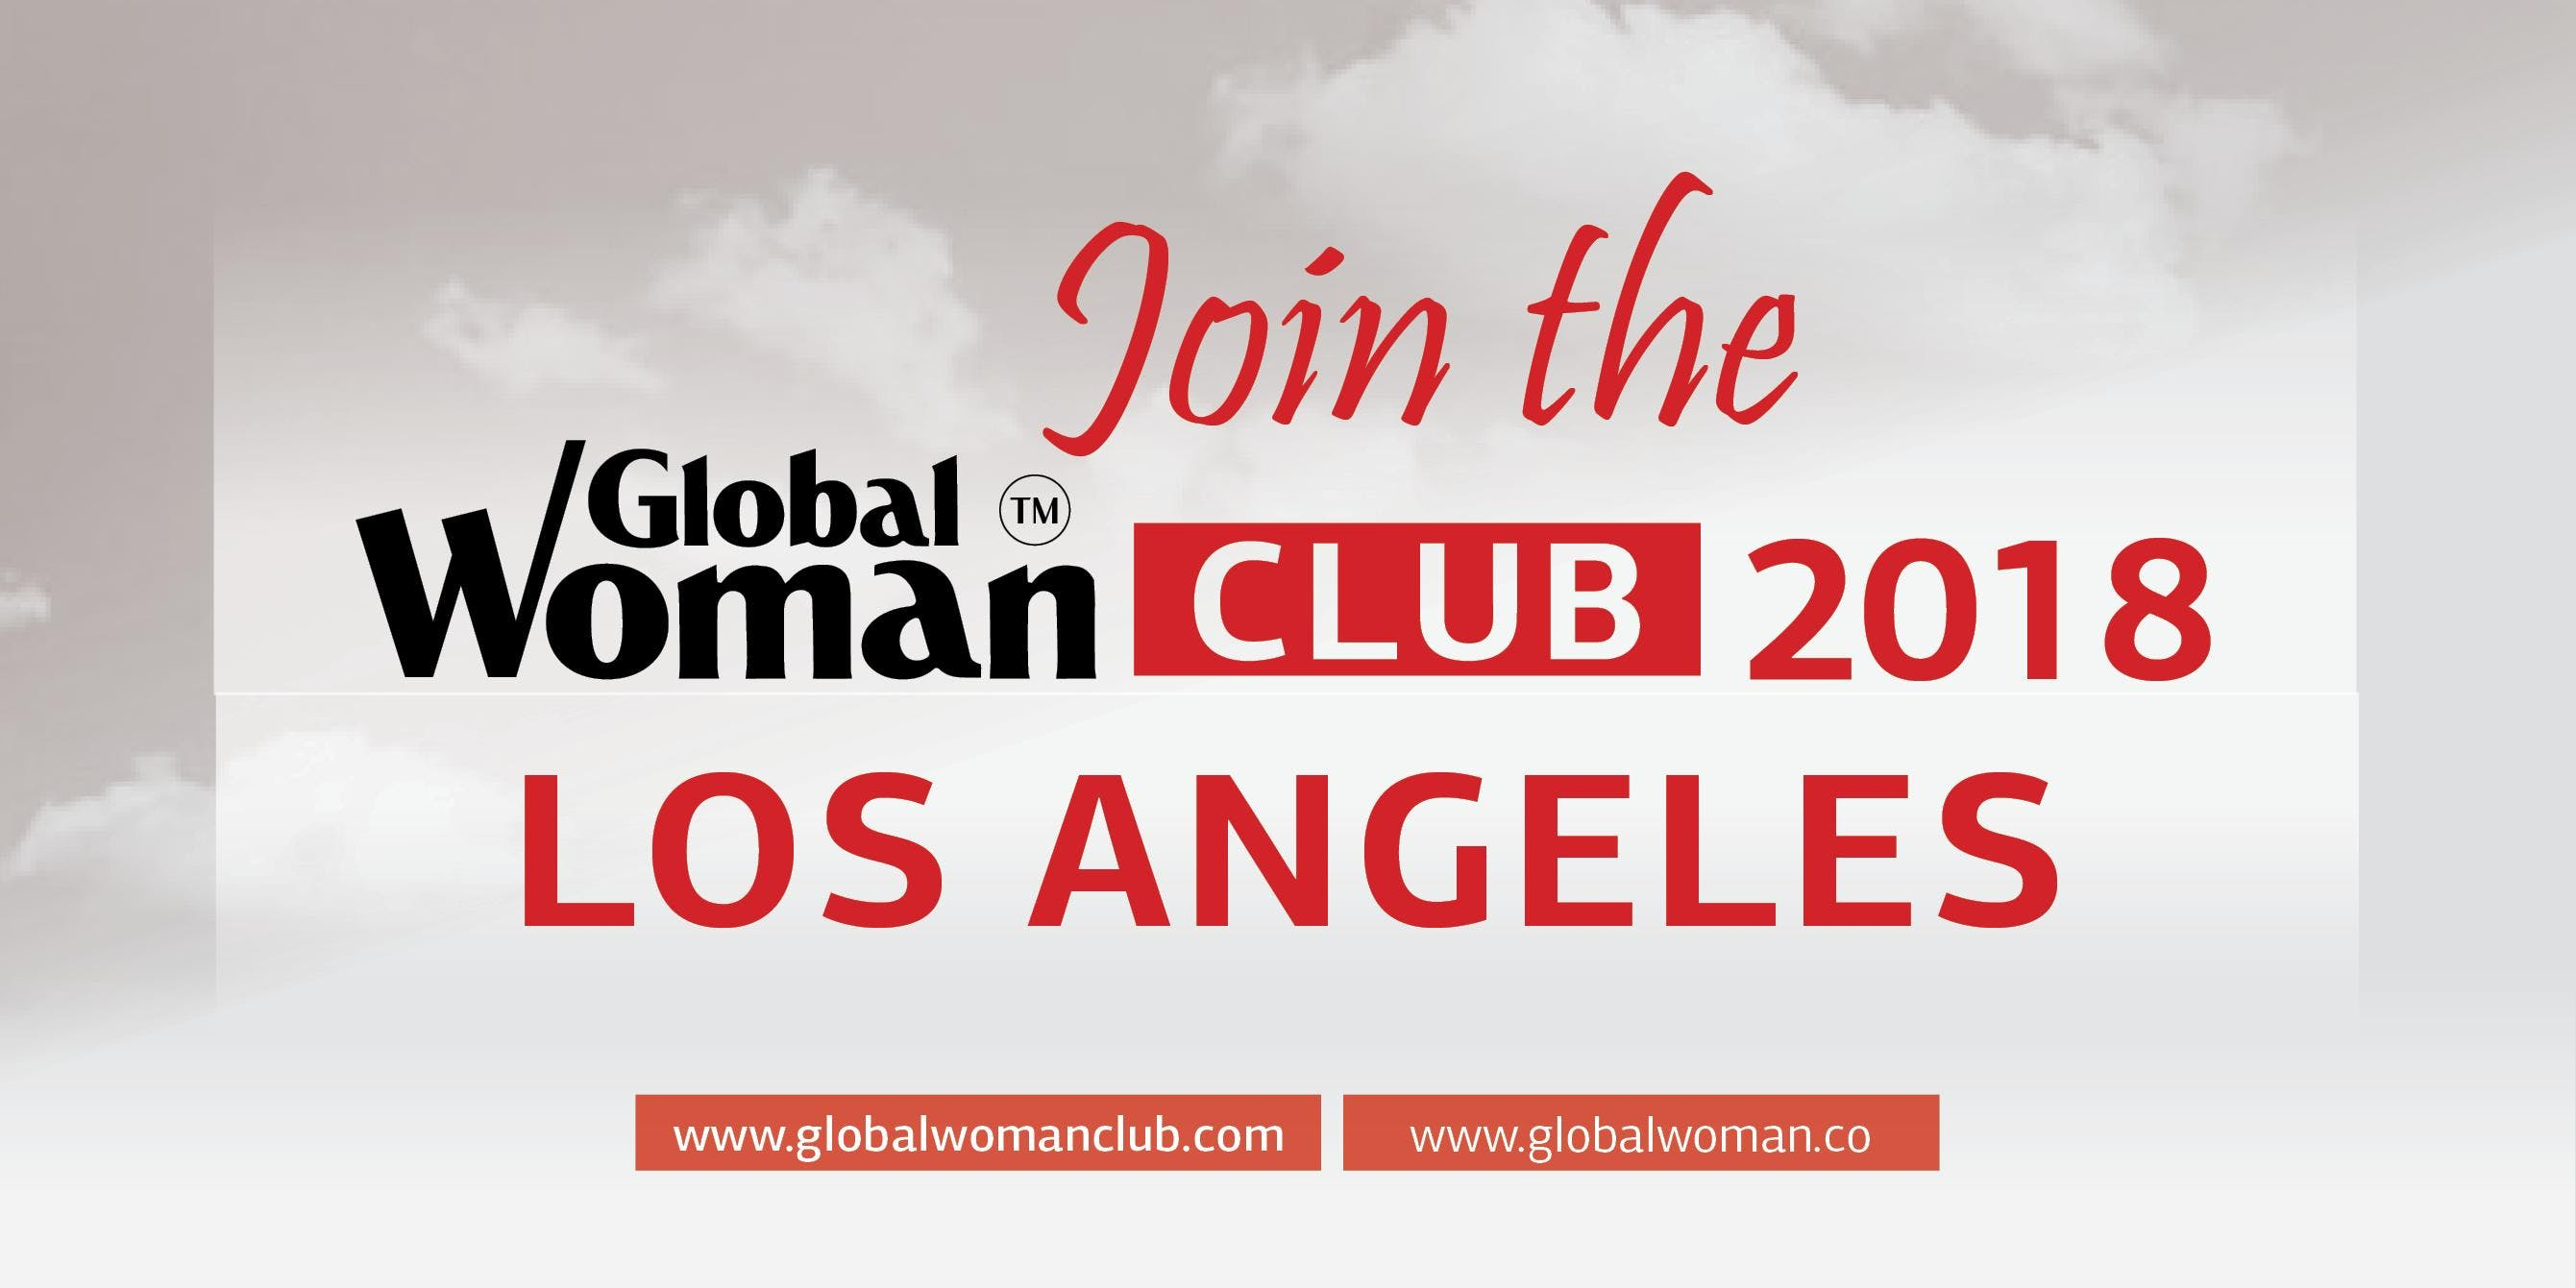 GLOBAL WOMAN CLUB LOS ANGELES - BUSINESS BREA